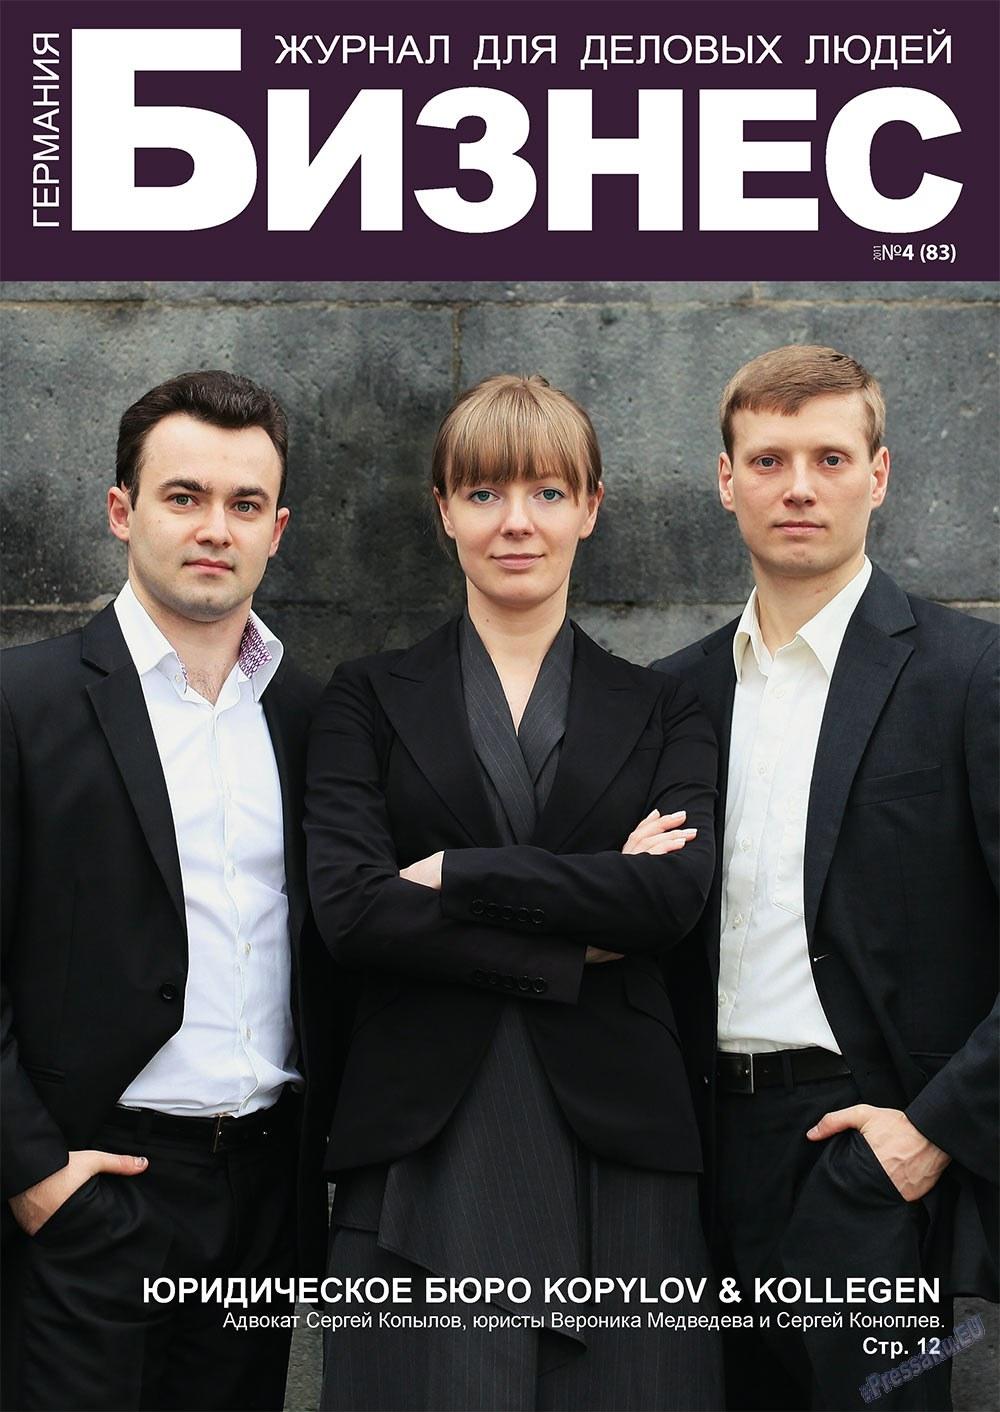 Бизнес (журнал). 2011 год, номер 4, стр. 1